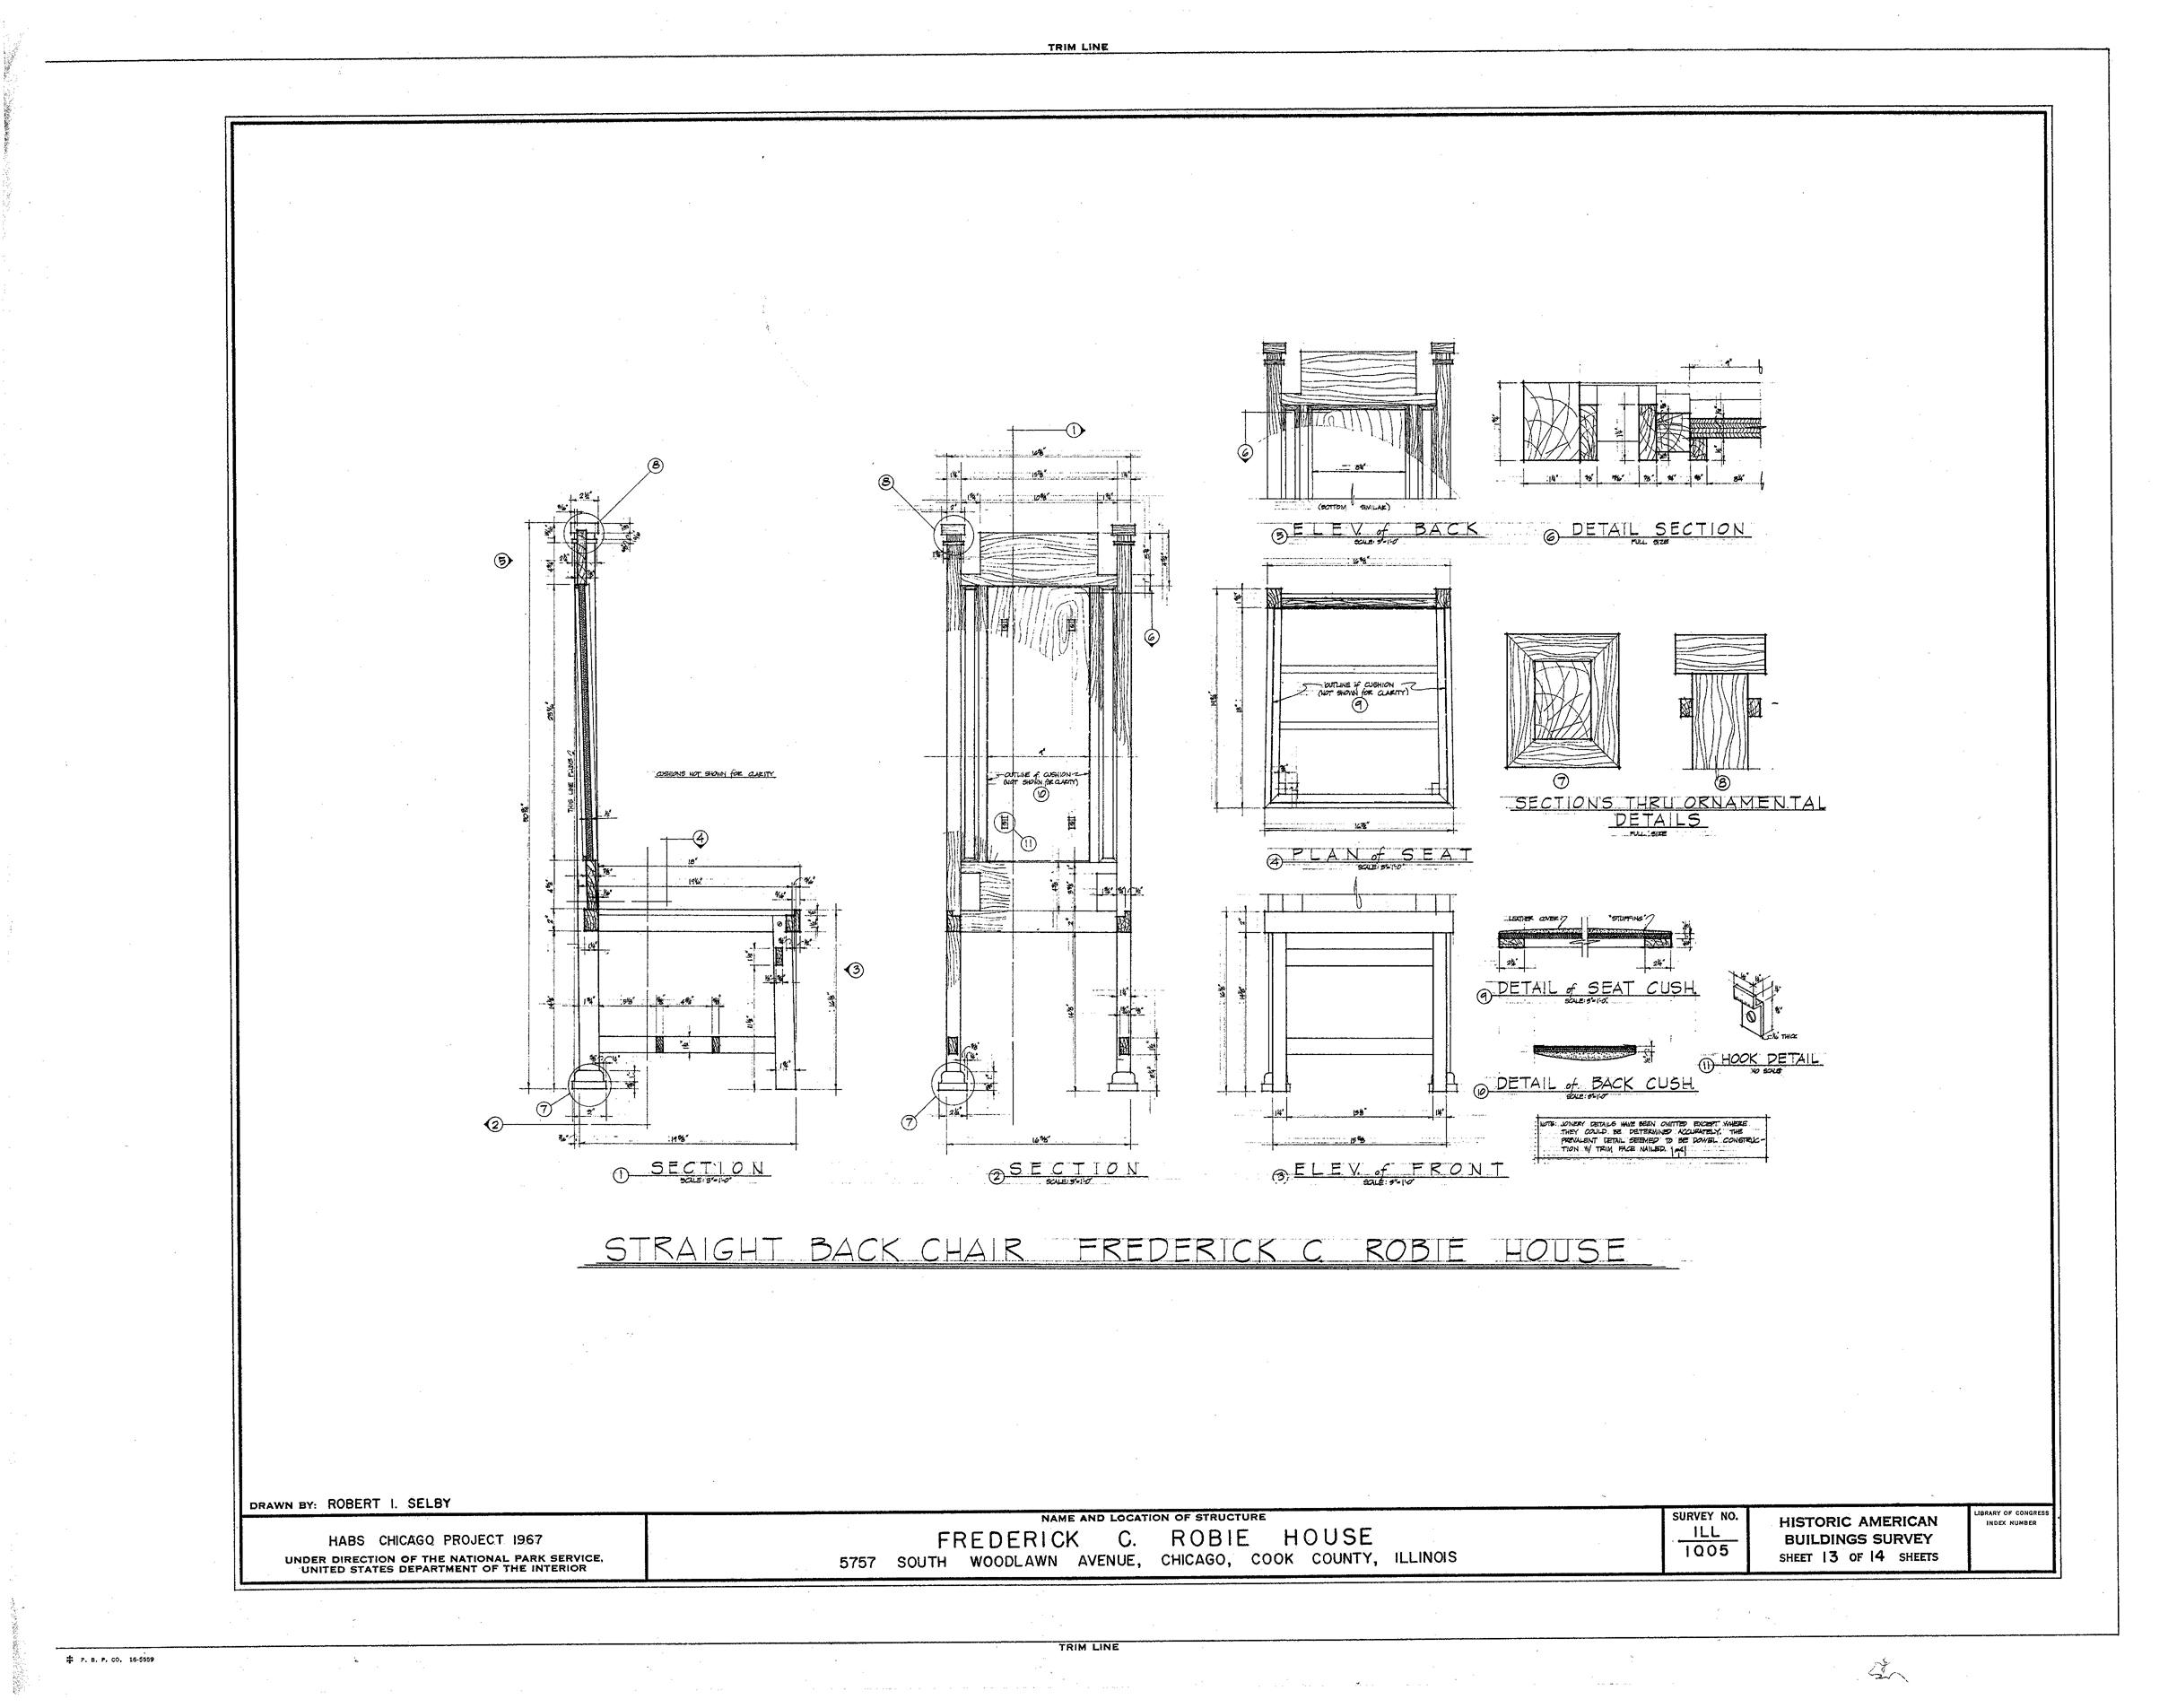 00013r Wikiarquitectura